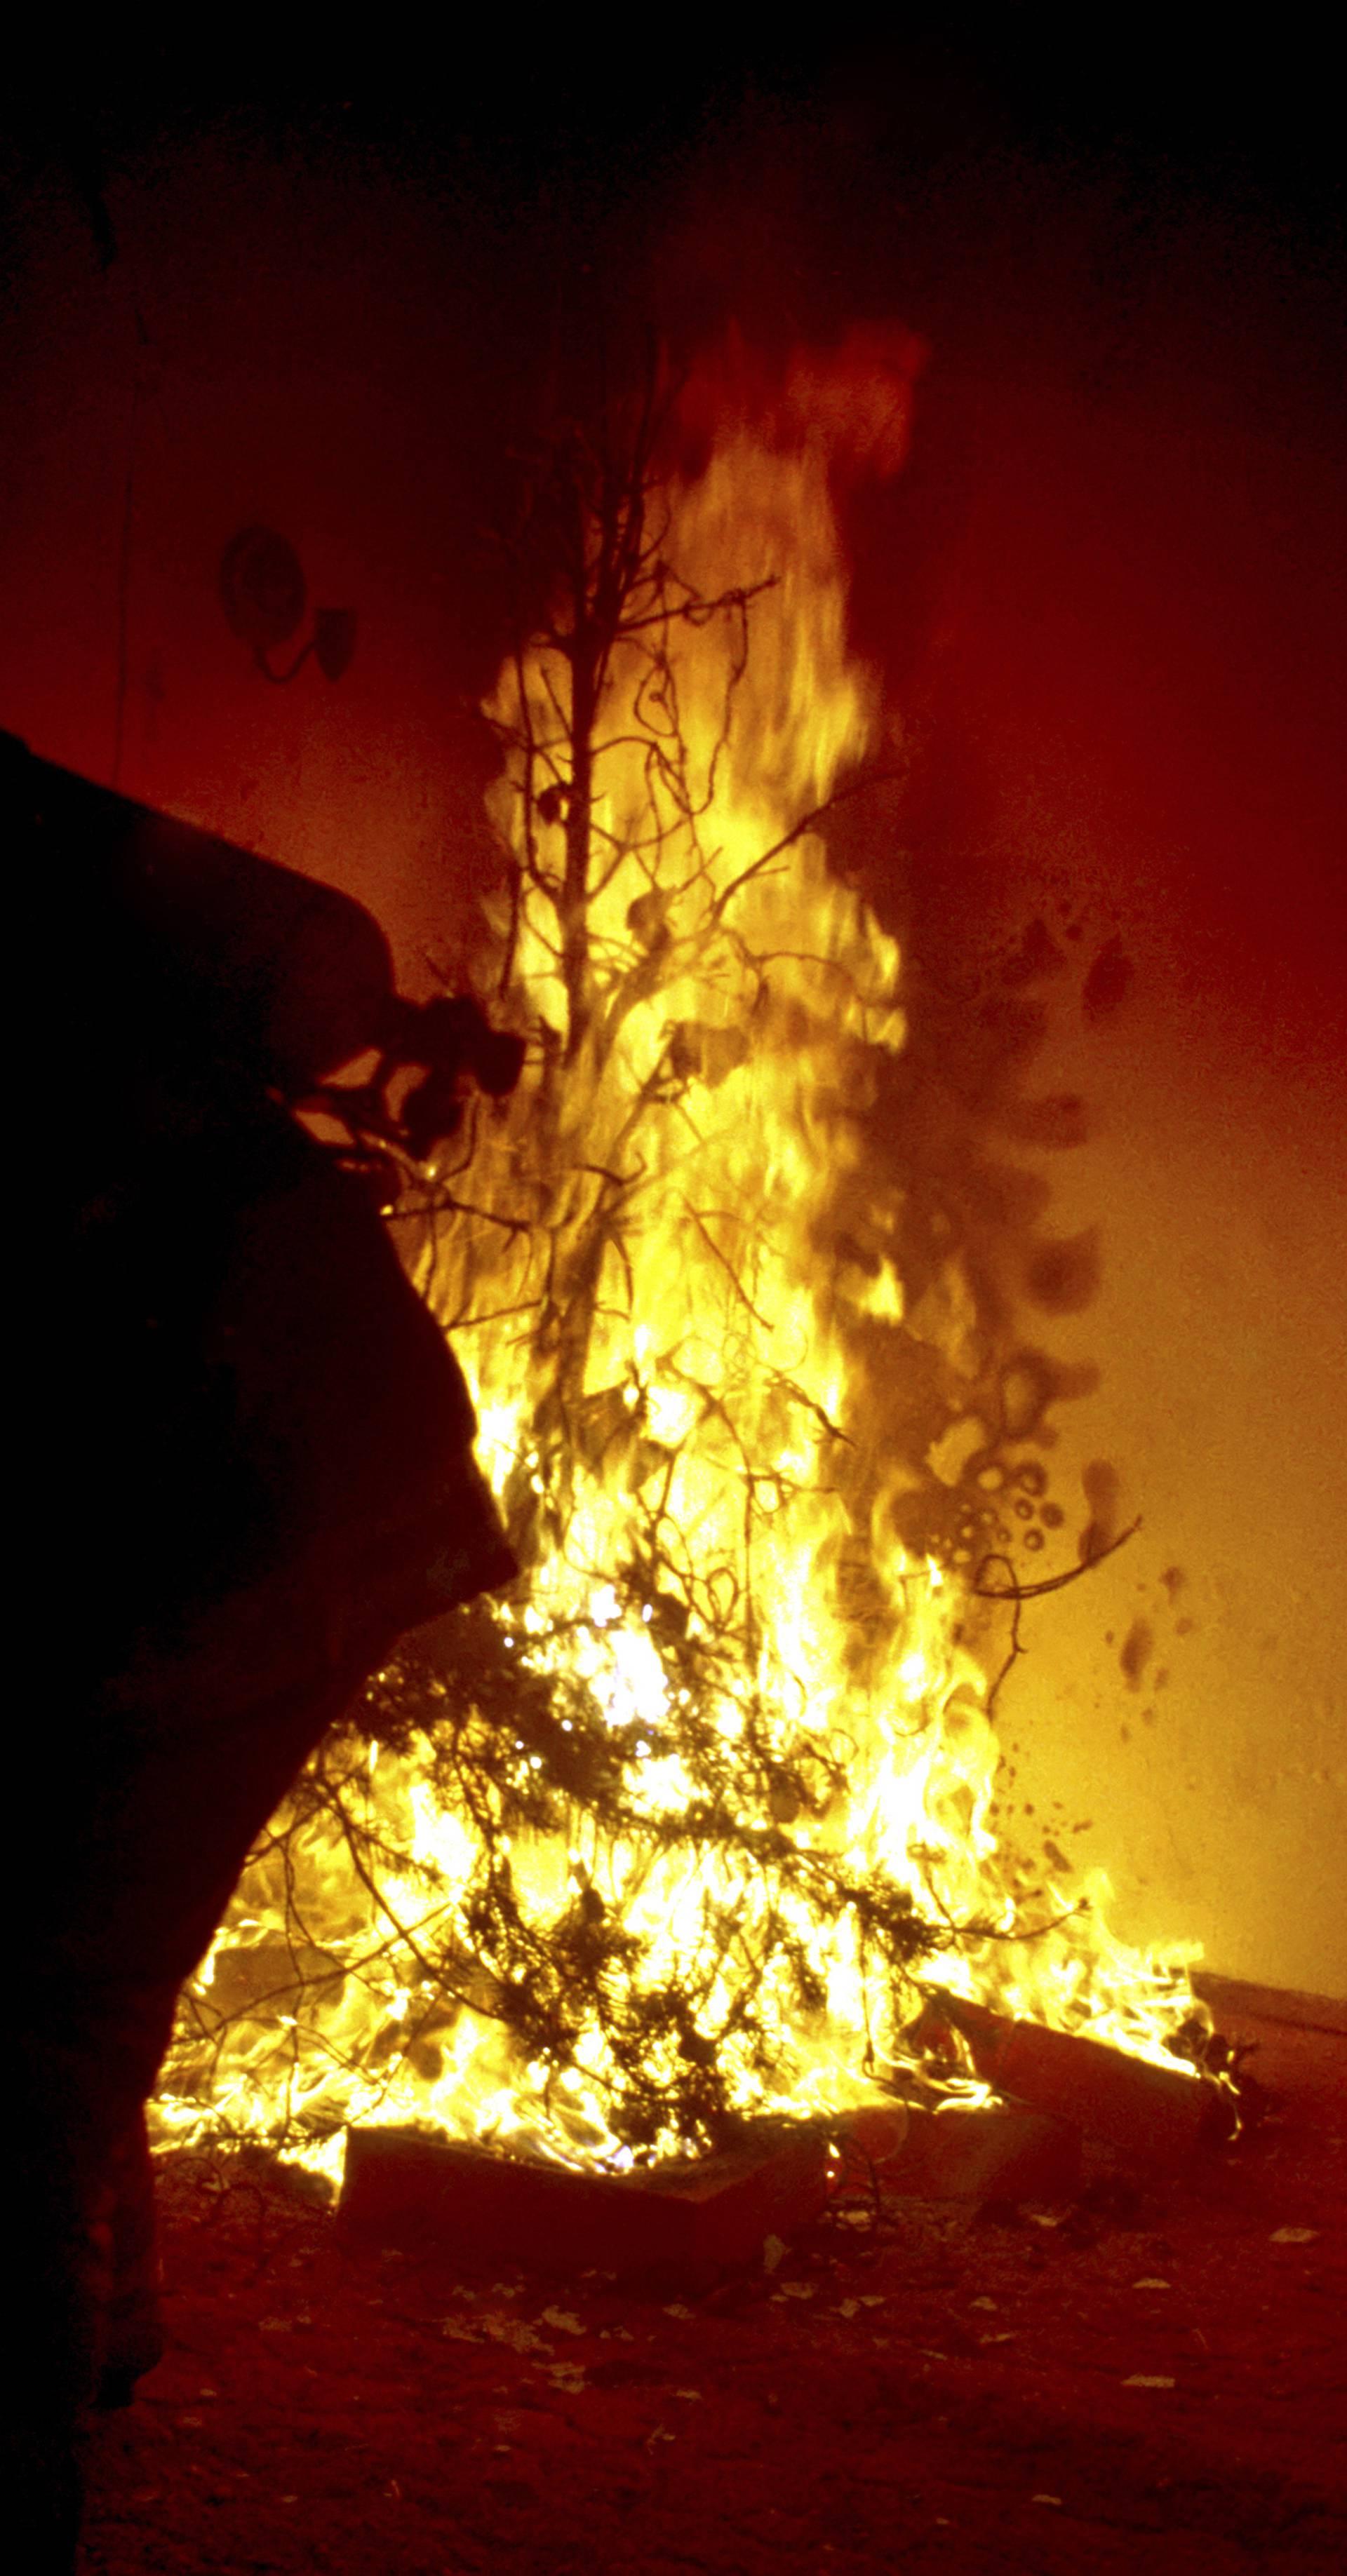 Planule dvije vikendice: Policija sumnja da je požar podmetnut